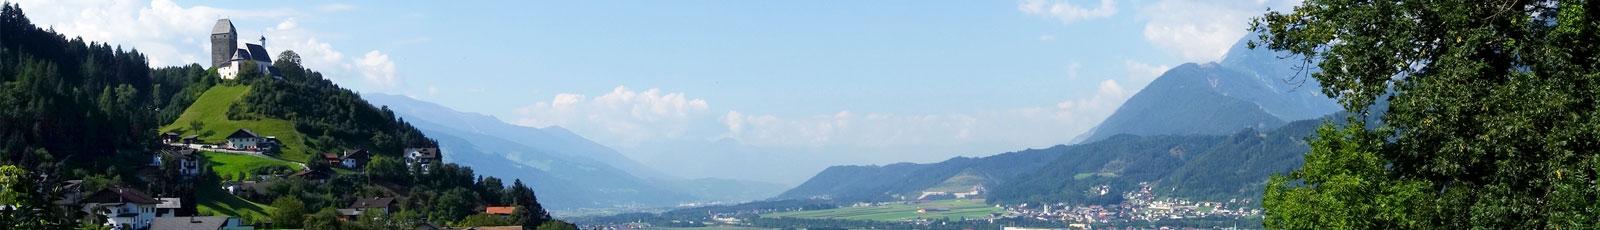 Schloss Frundsberg